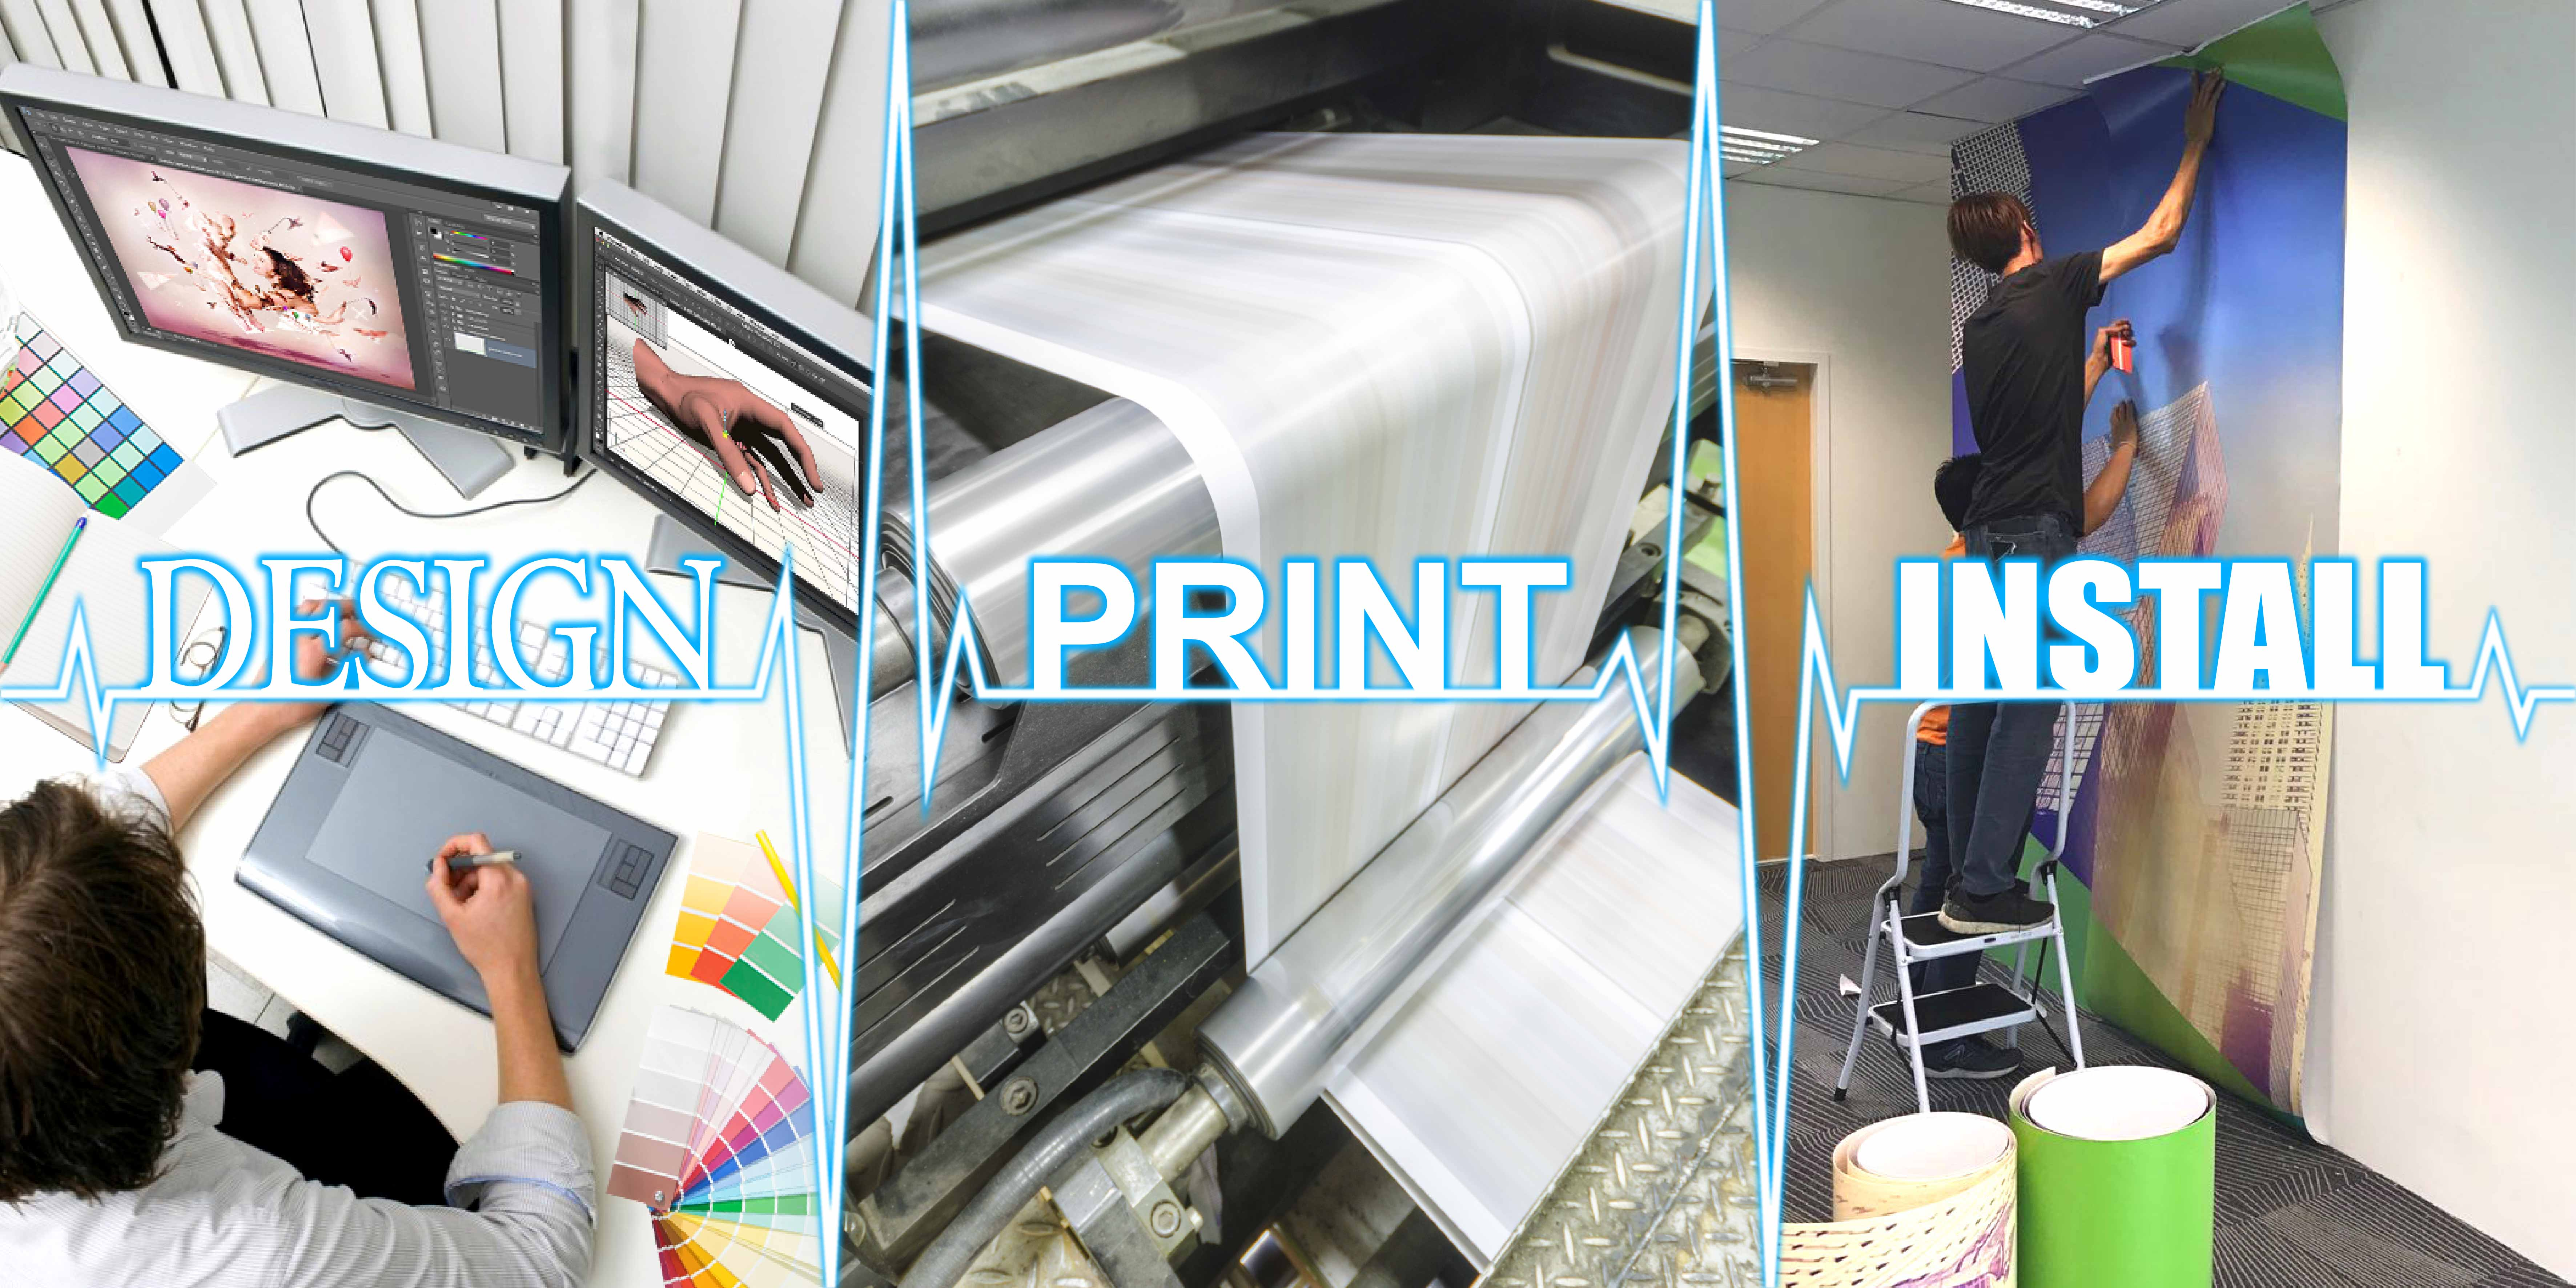 03-Design-Print-Install-01